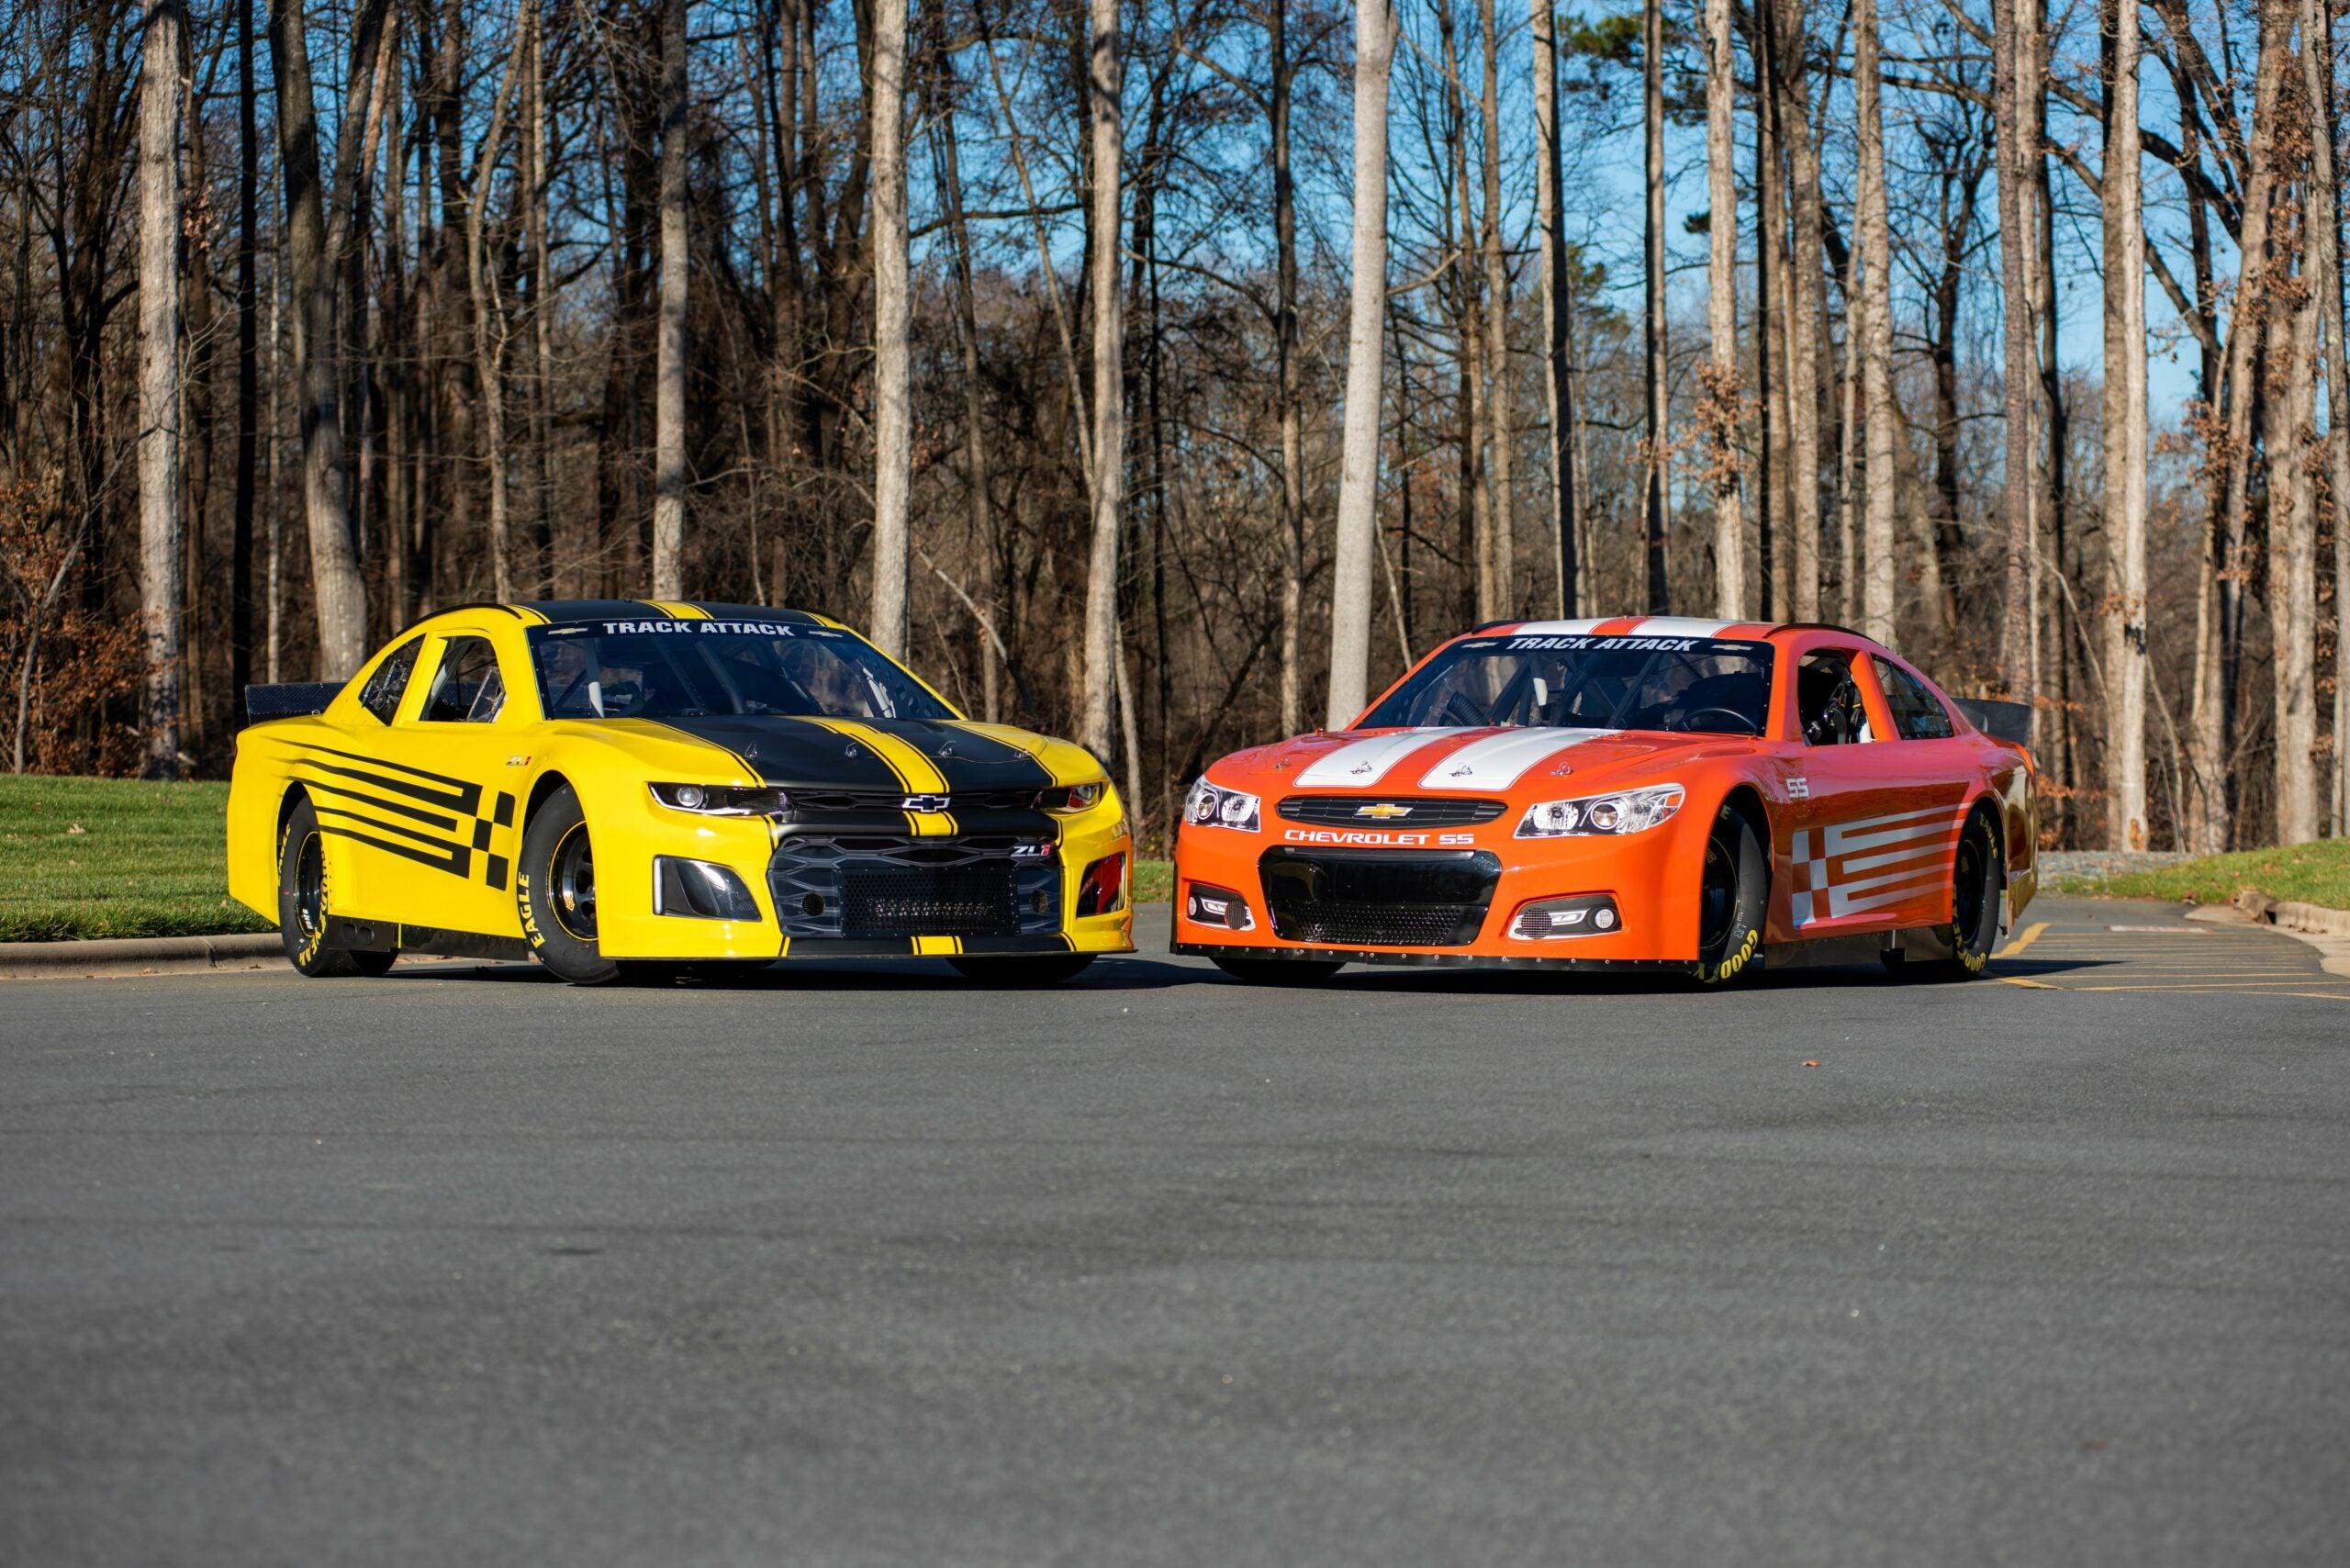 Hendrick Motorsports track attack cars